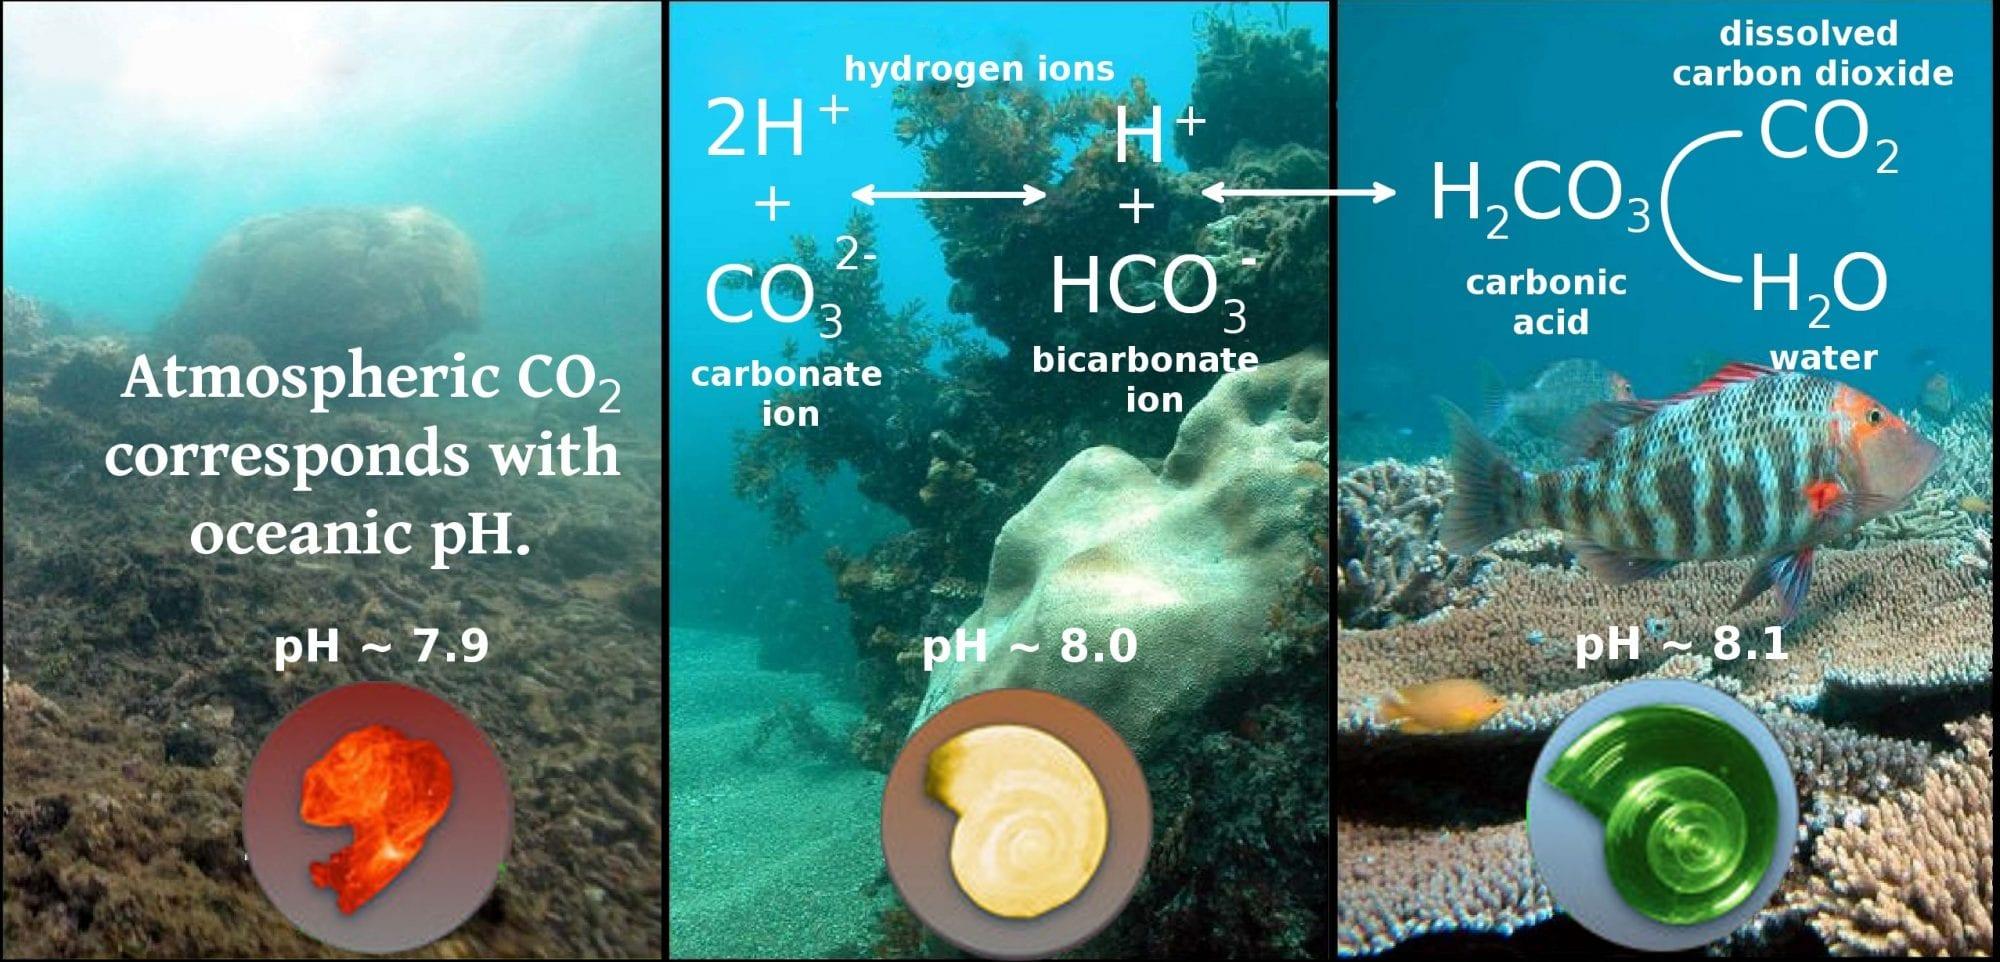 carbon-dioxide-in-the-ocean-grafic.jpg